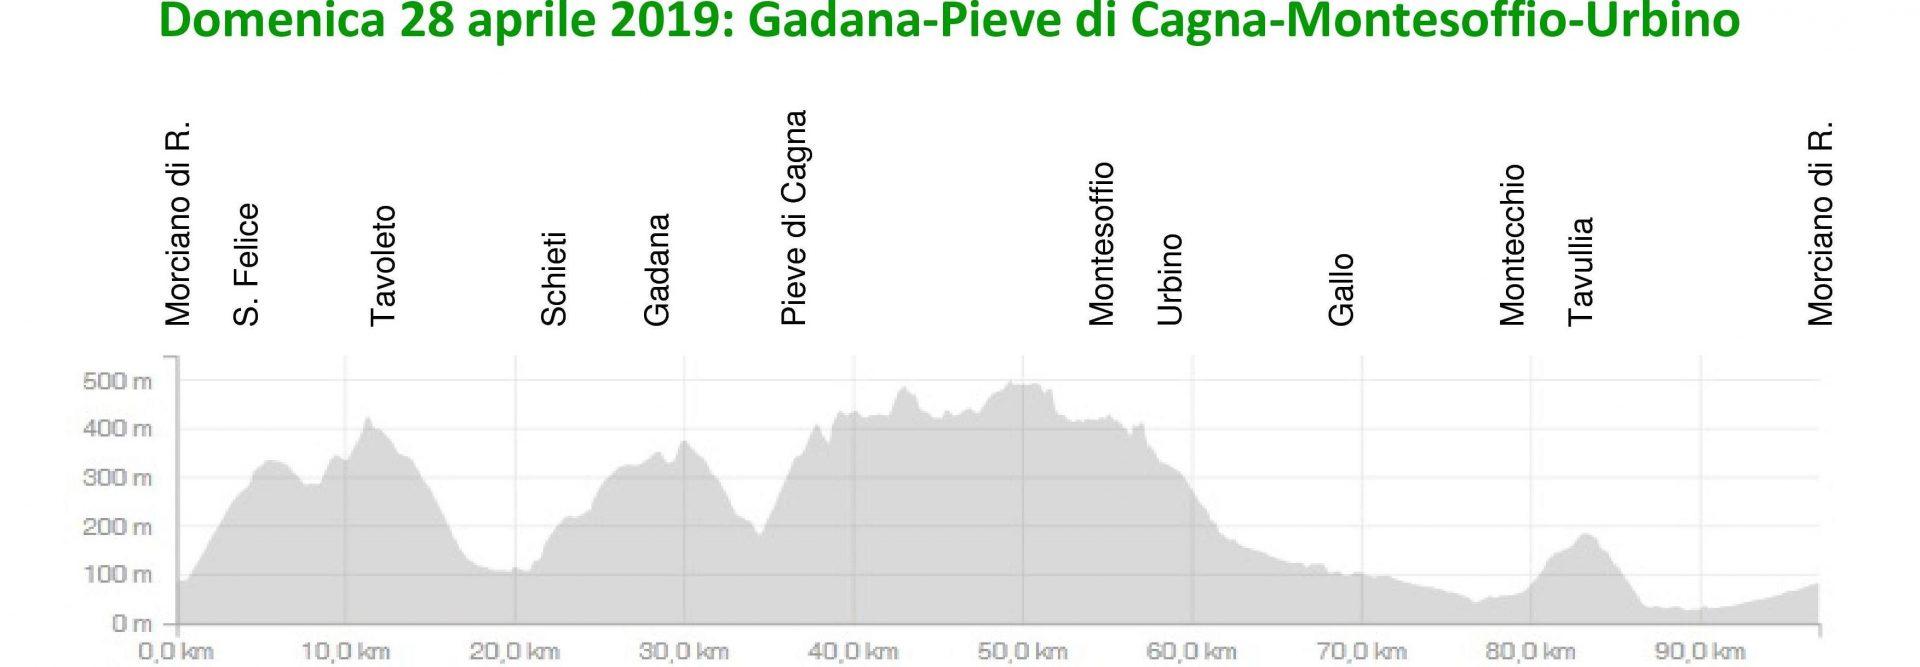 Domenica 28-apr-2019 Gadana Pieve di Cagna